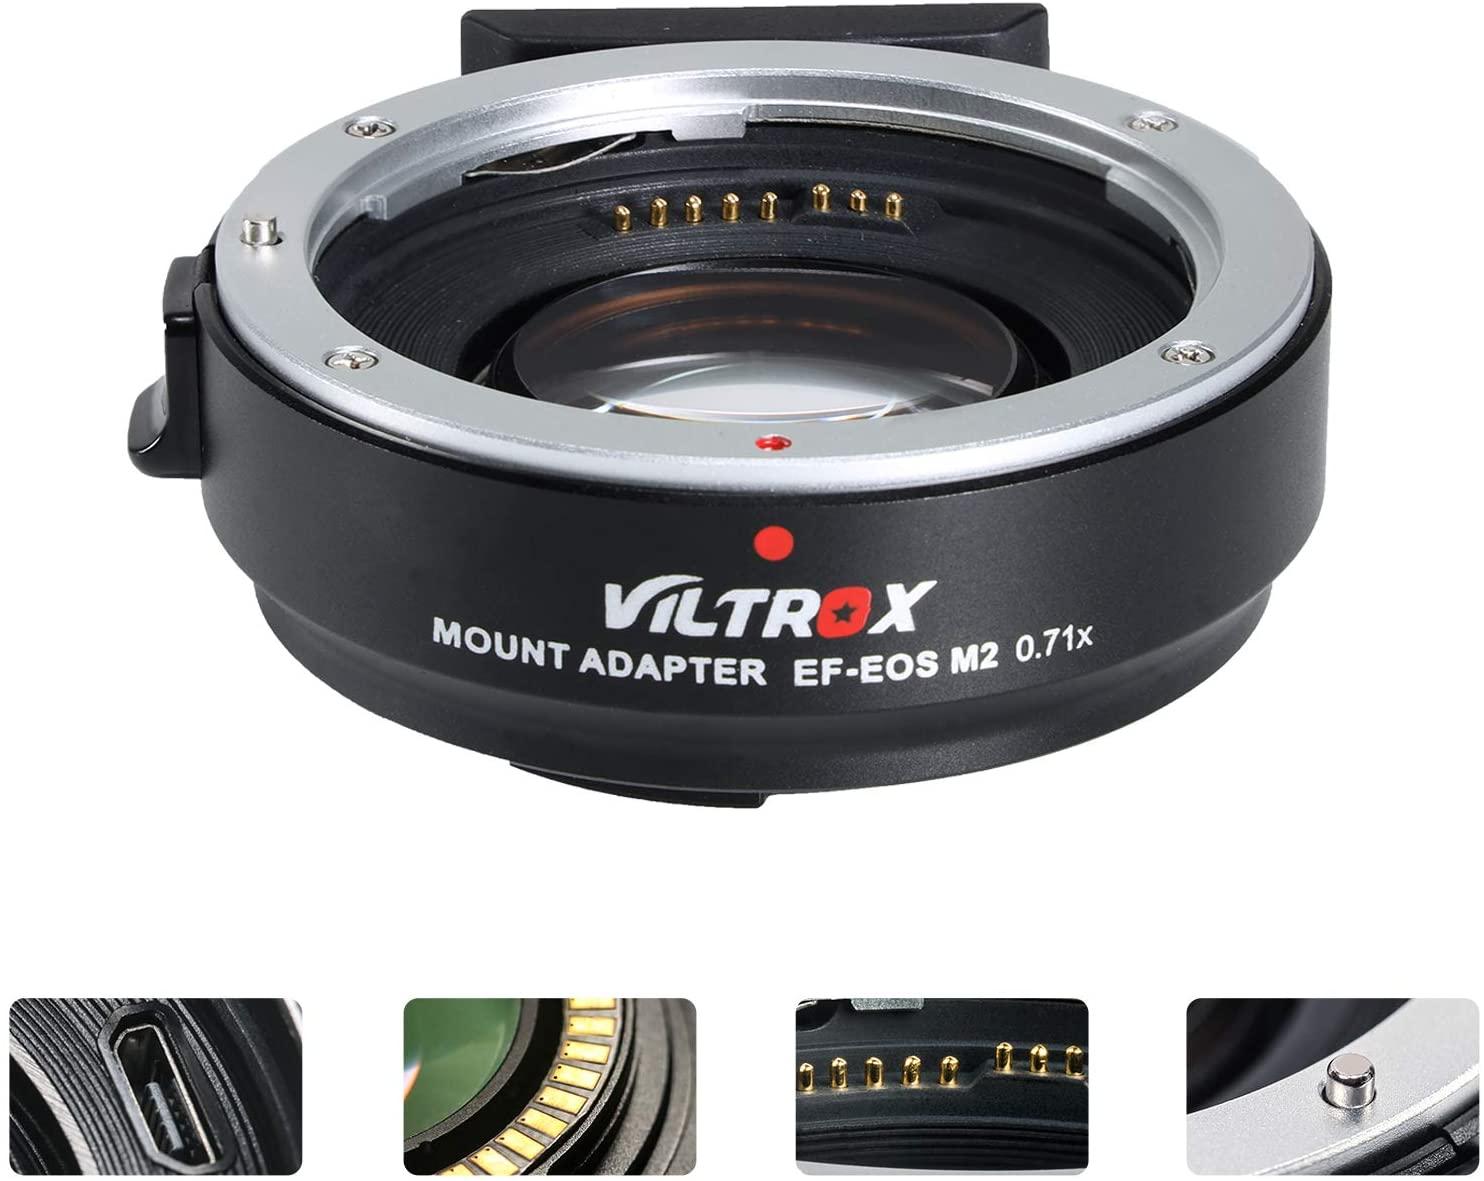 viltrox lens adaptor for canon